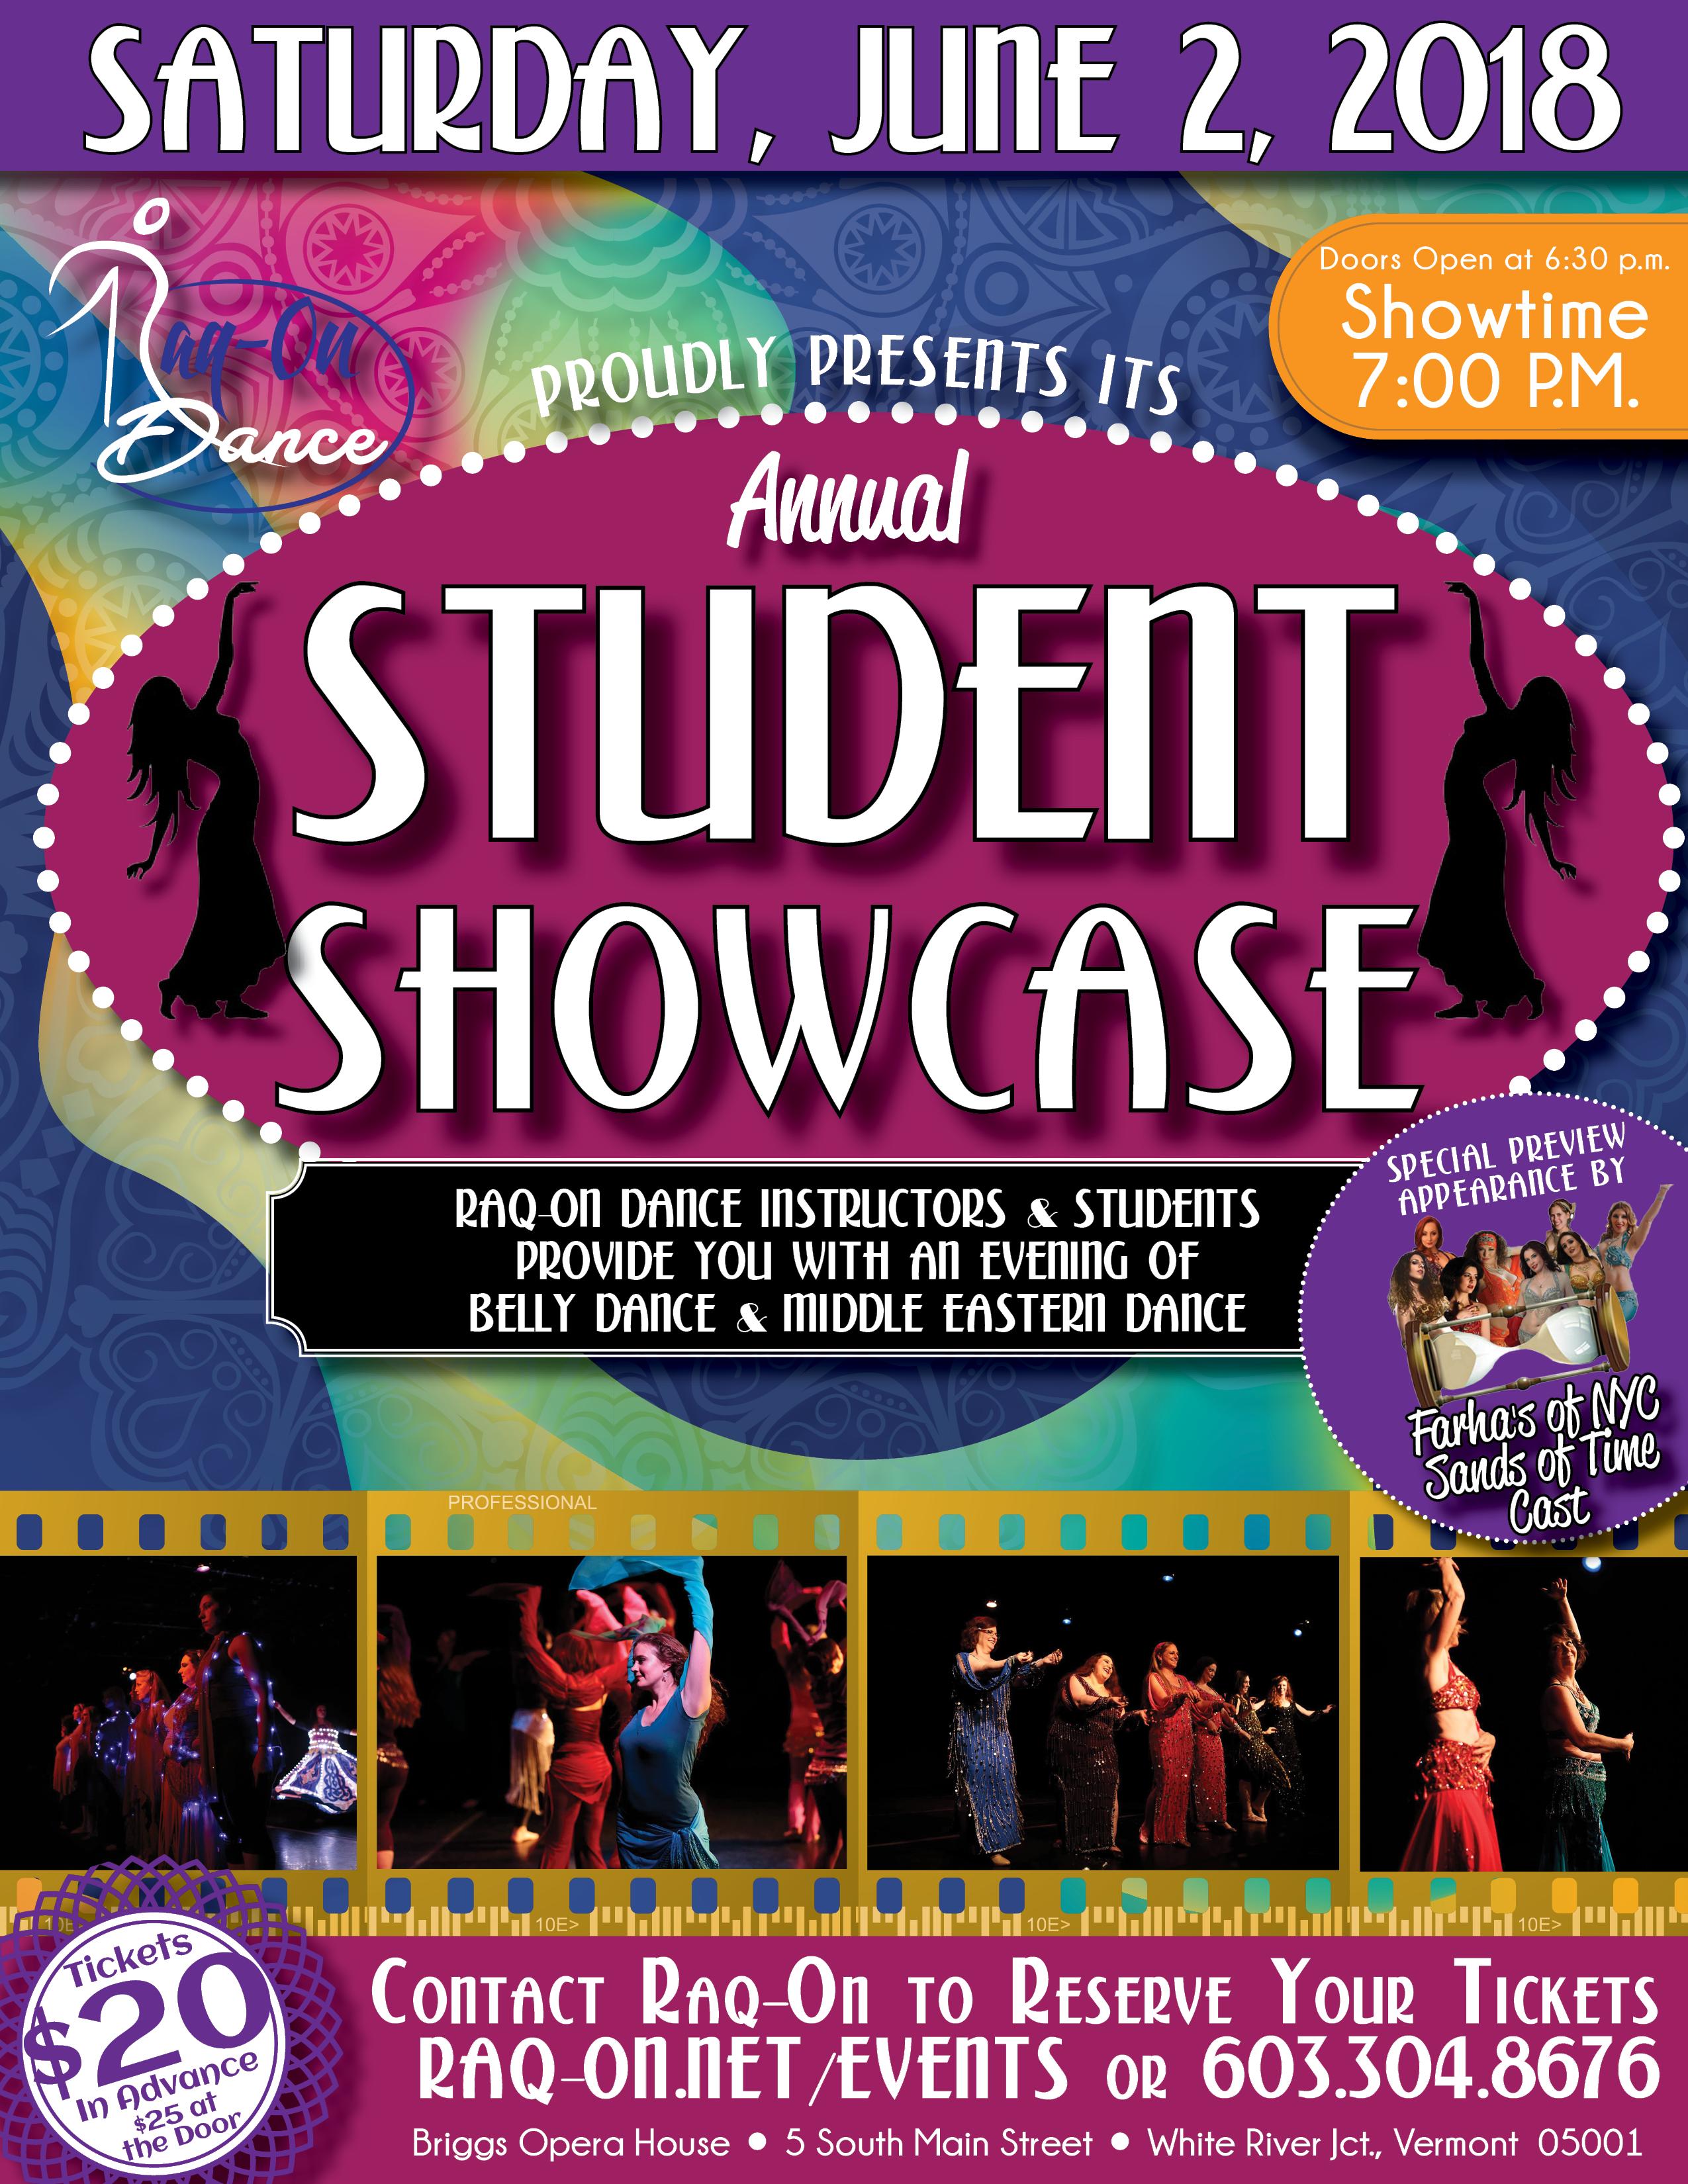 Raq-On Student Showcase Flyer